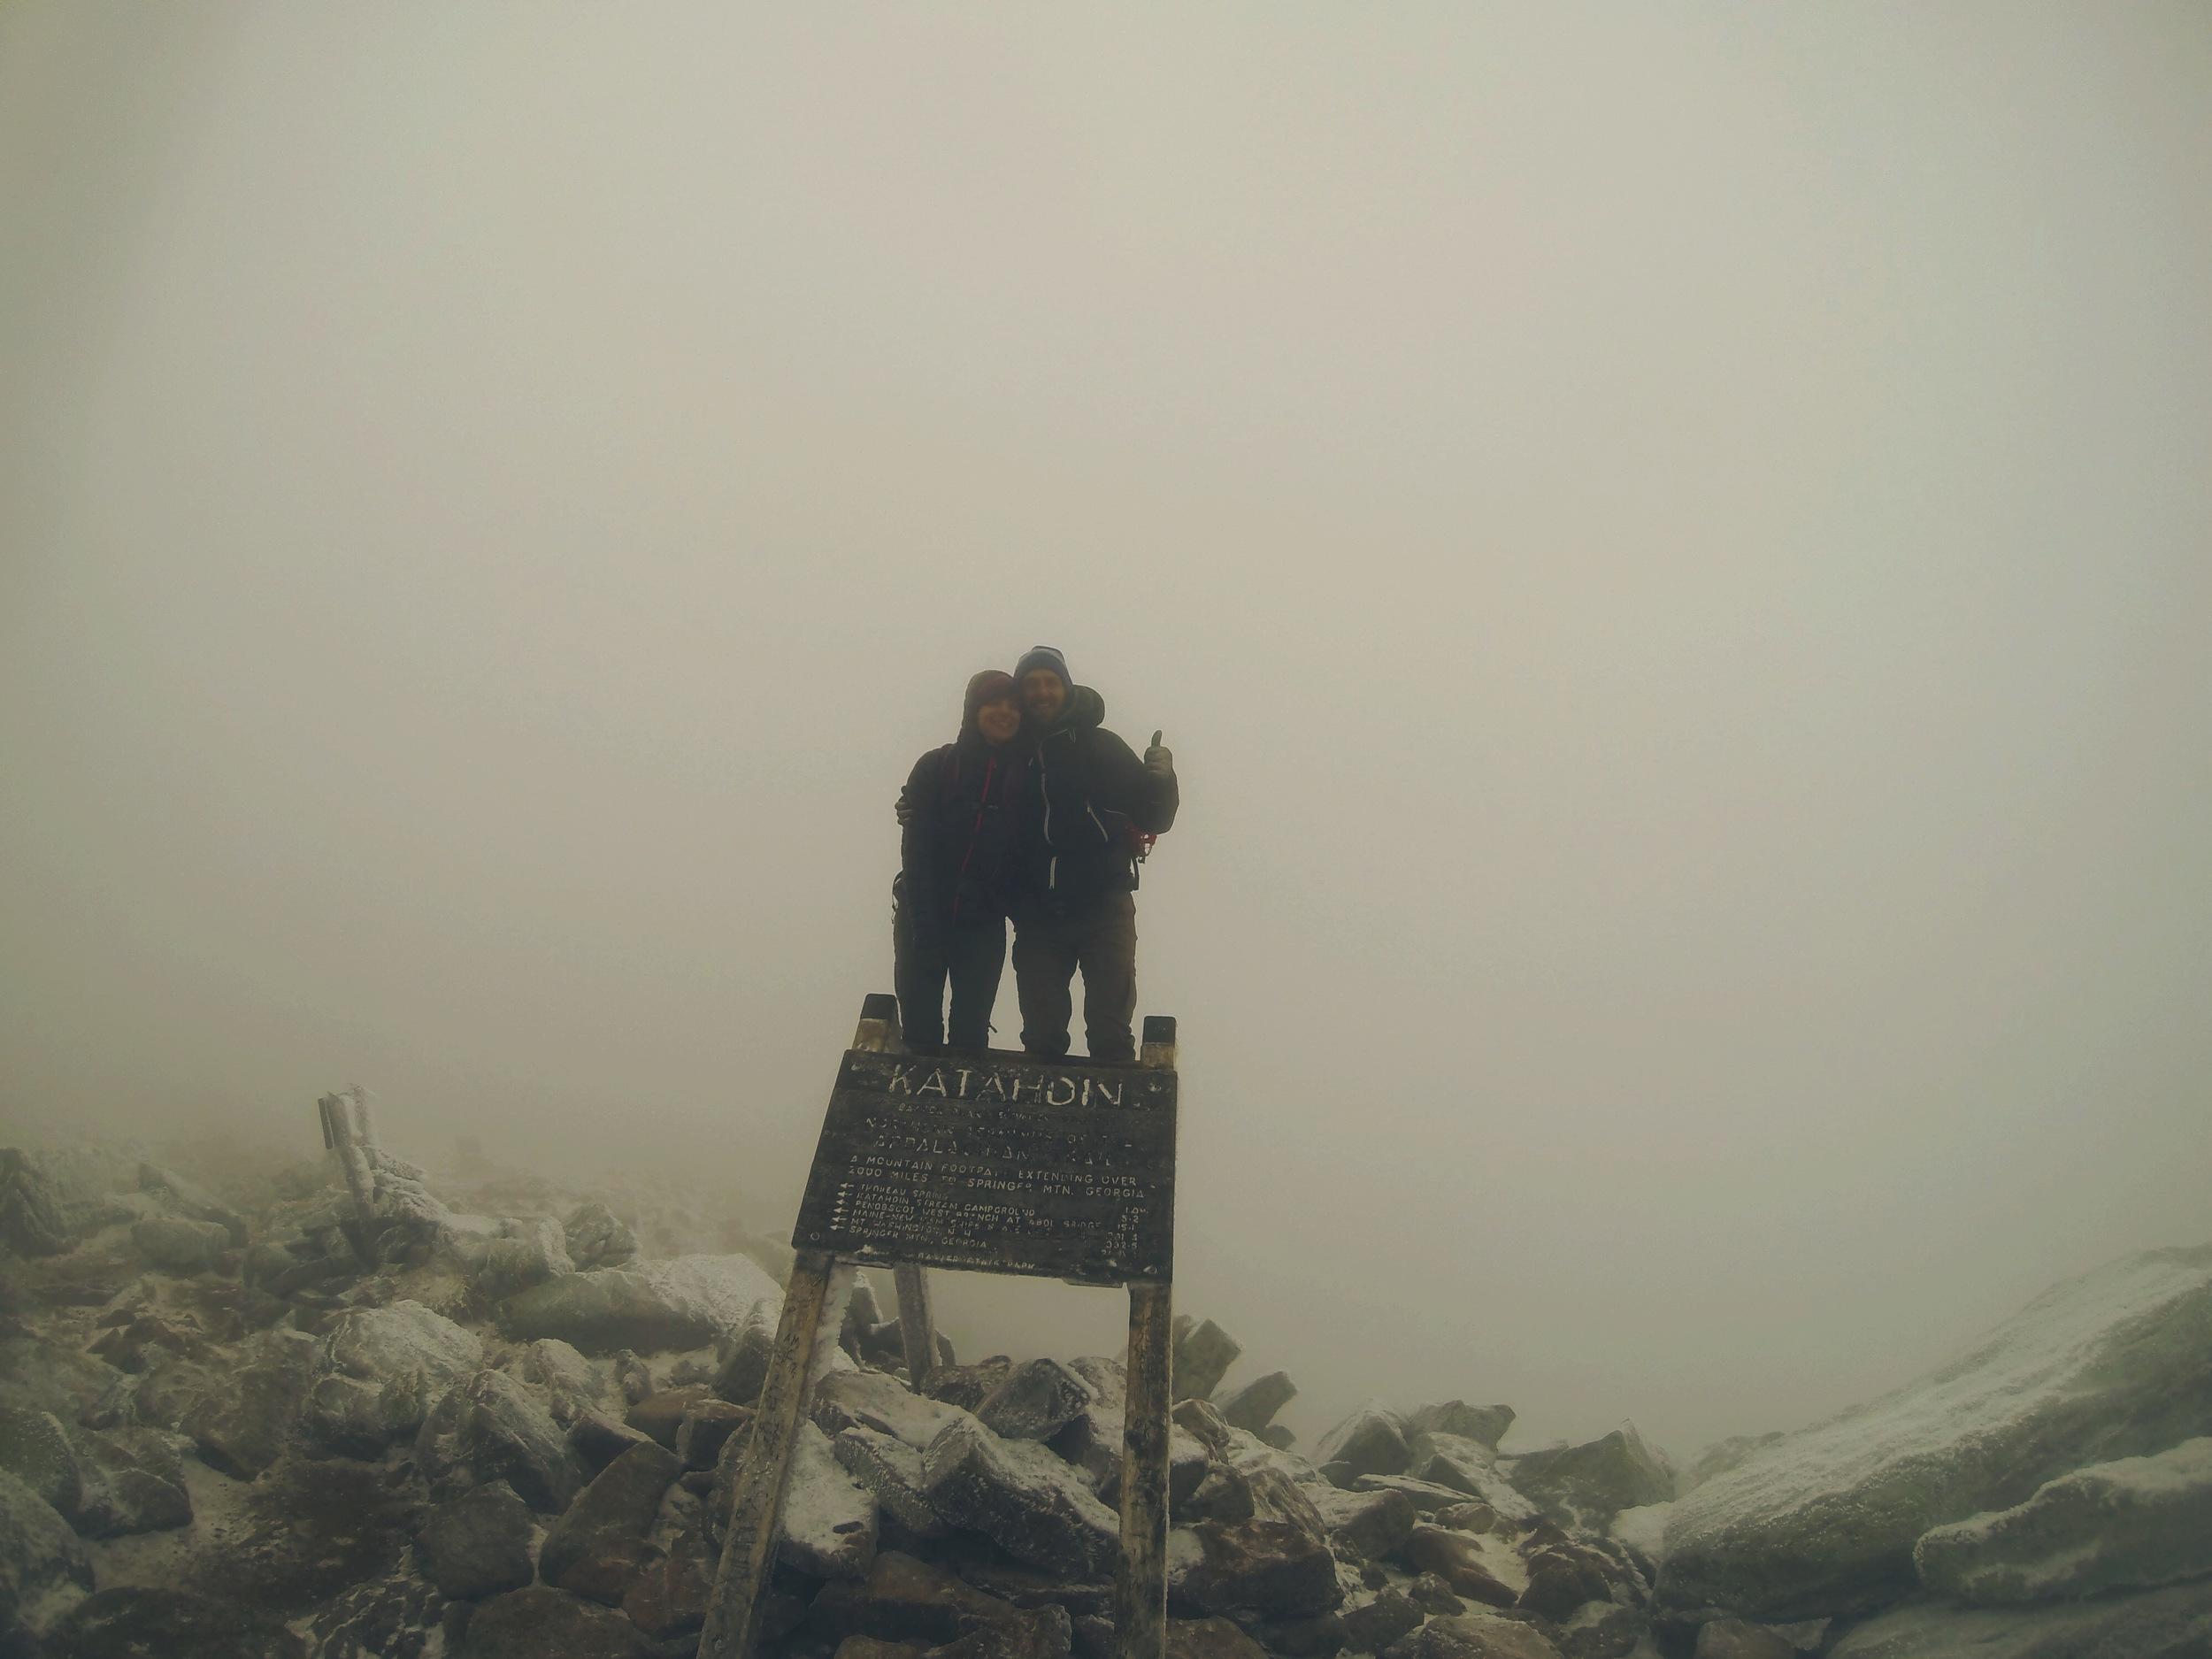 No blue skies here, Moose and Teton on the top of Katahdin